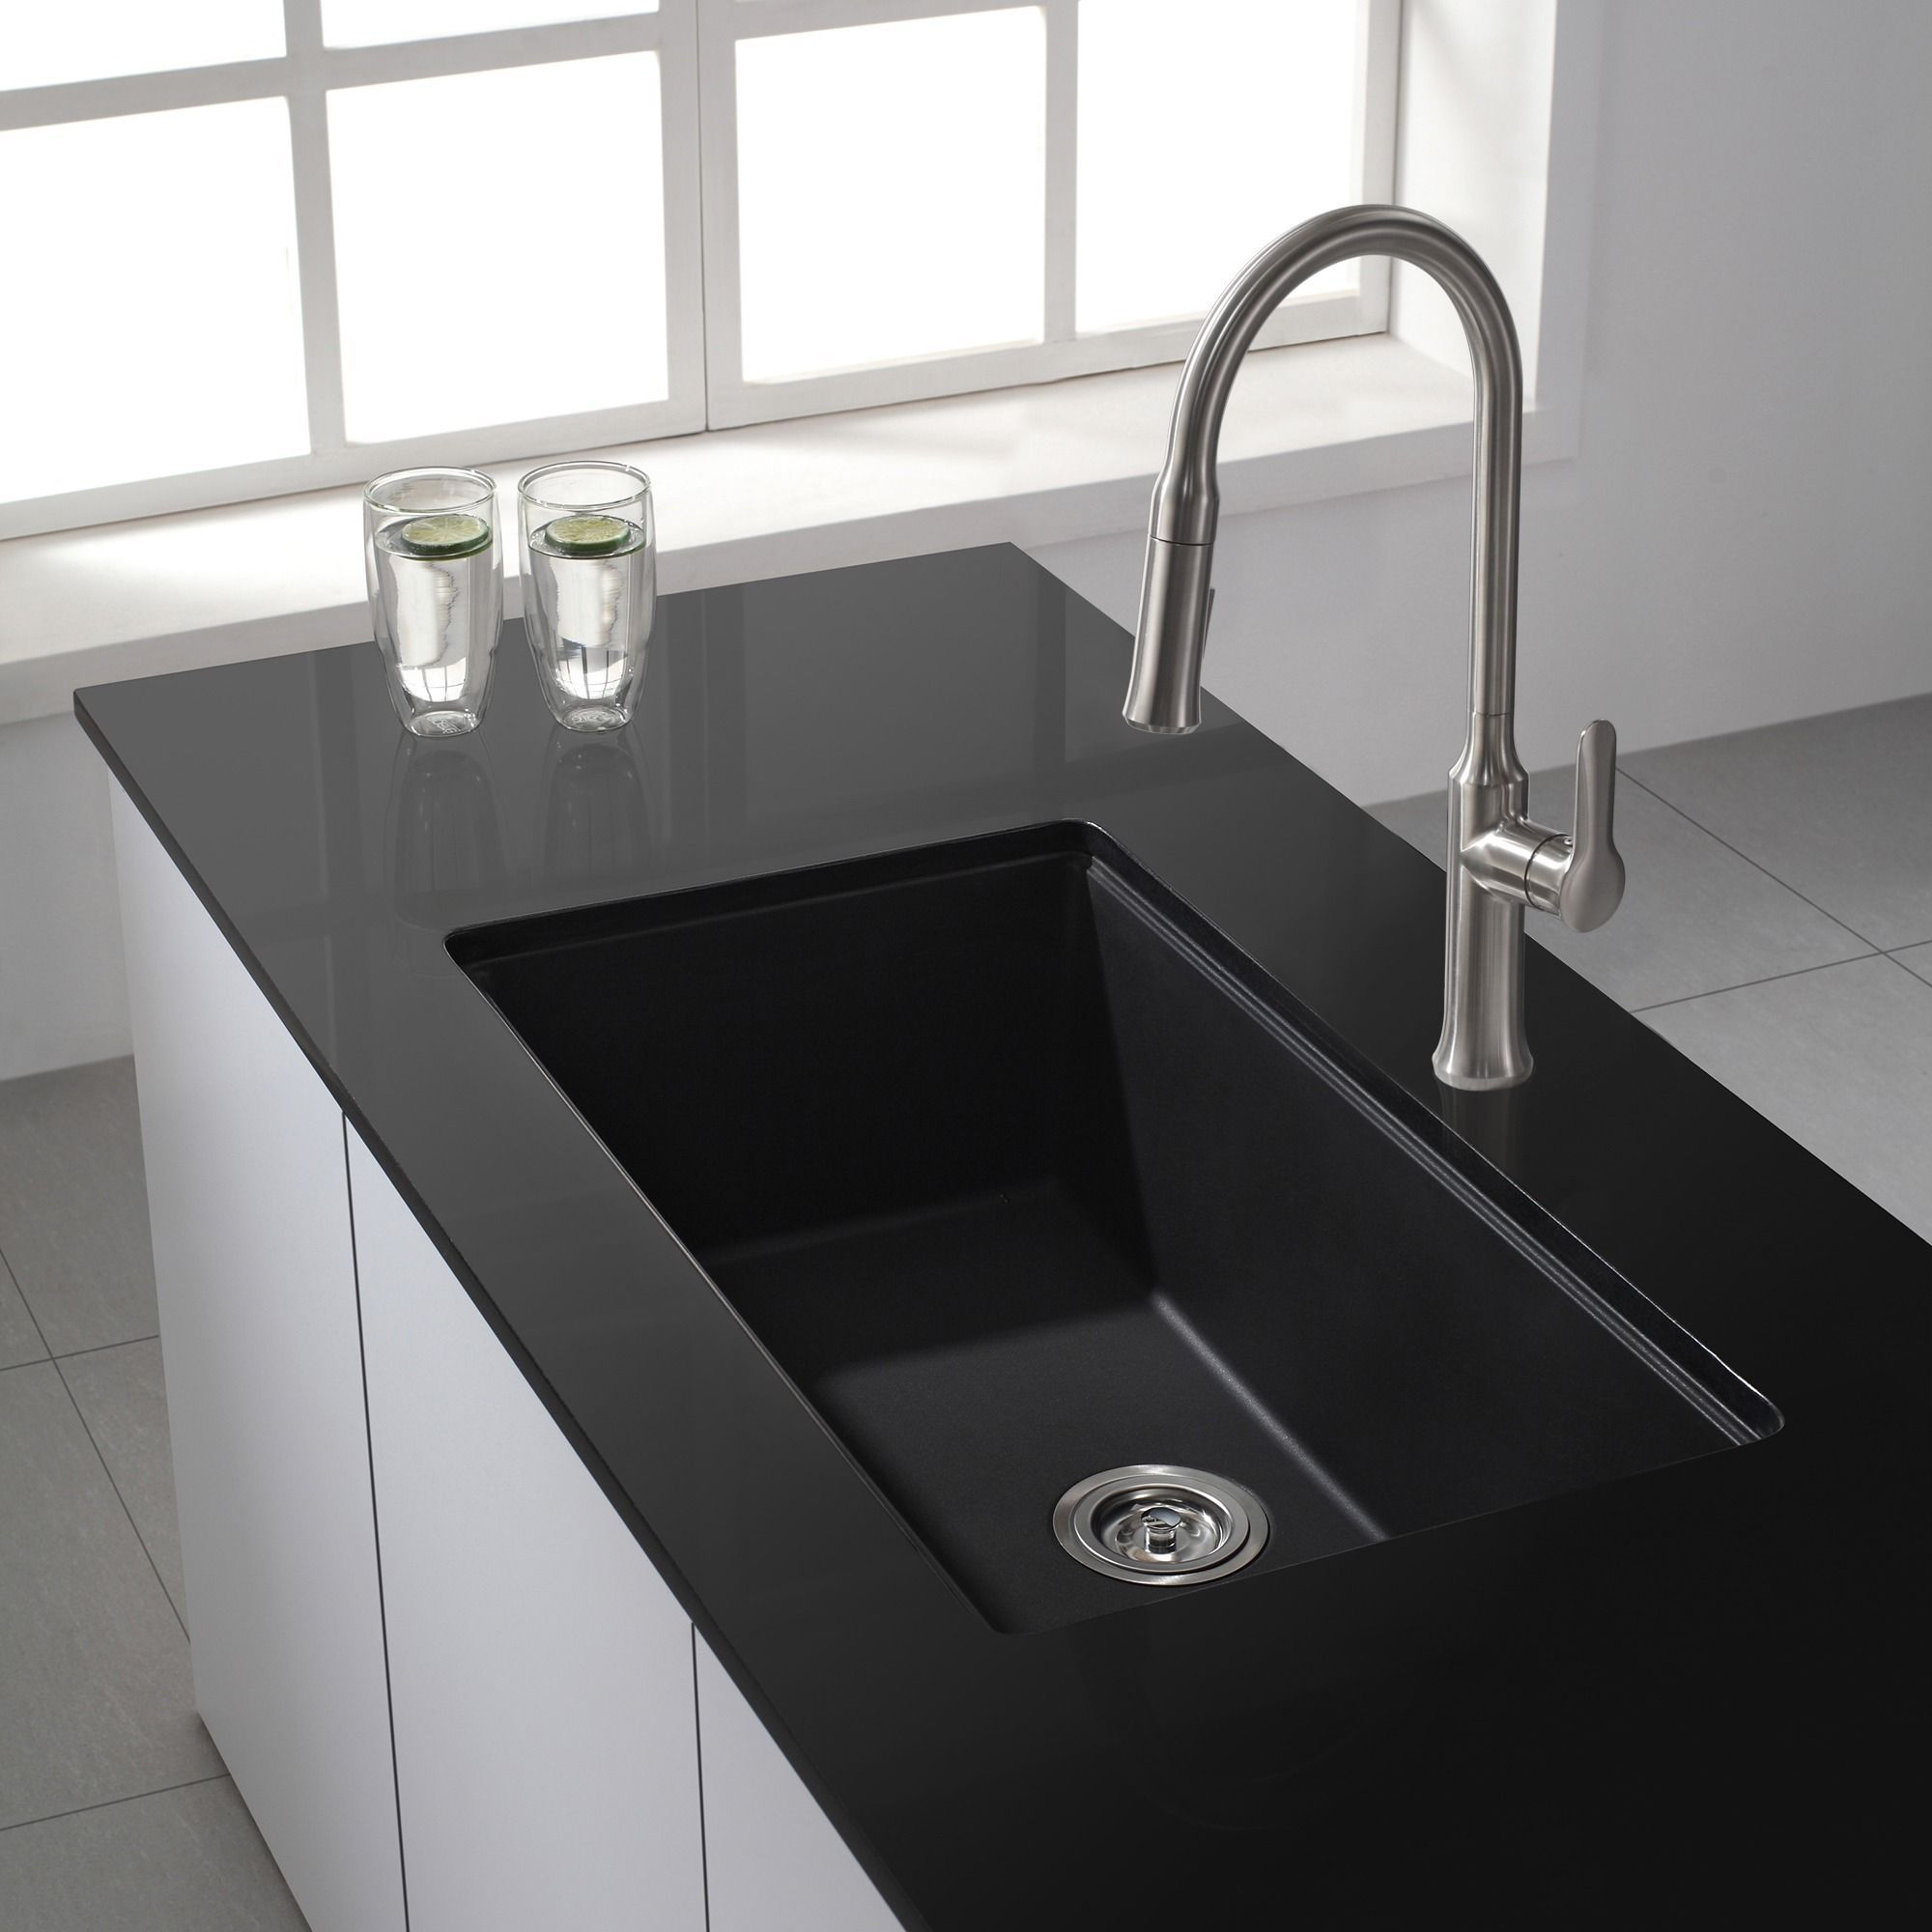 Kraus 31 inch Undermount Single Bowl Black Onyx Granite Kitchen Sink (Onyx Black), Size Over 22